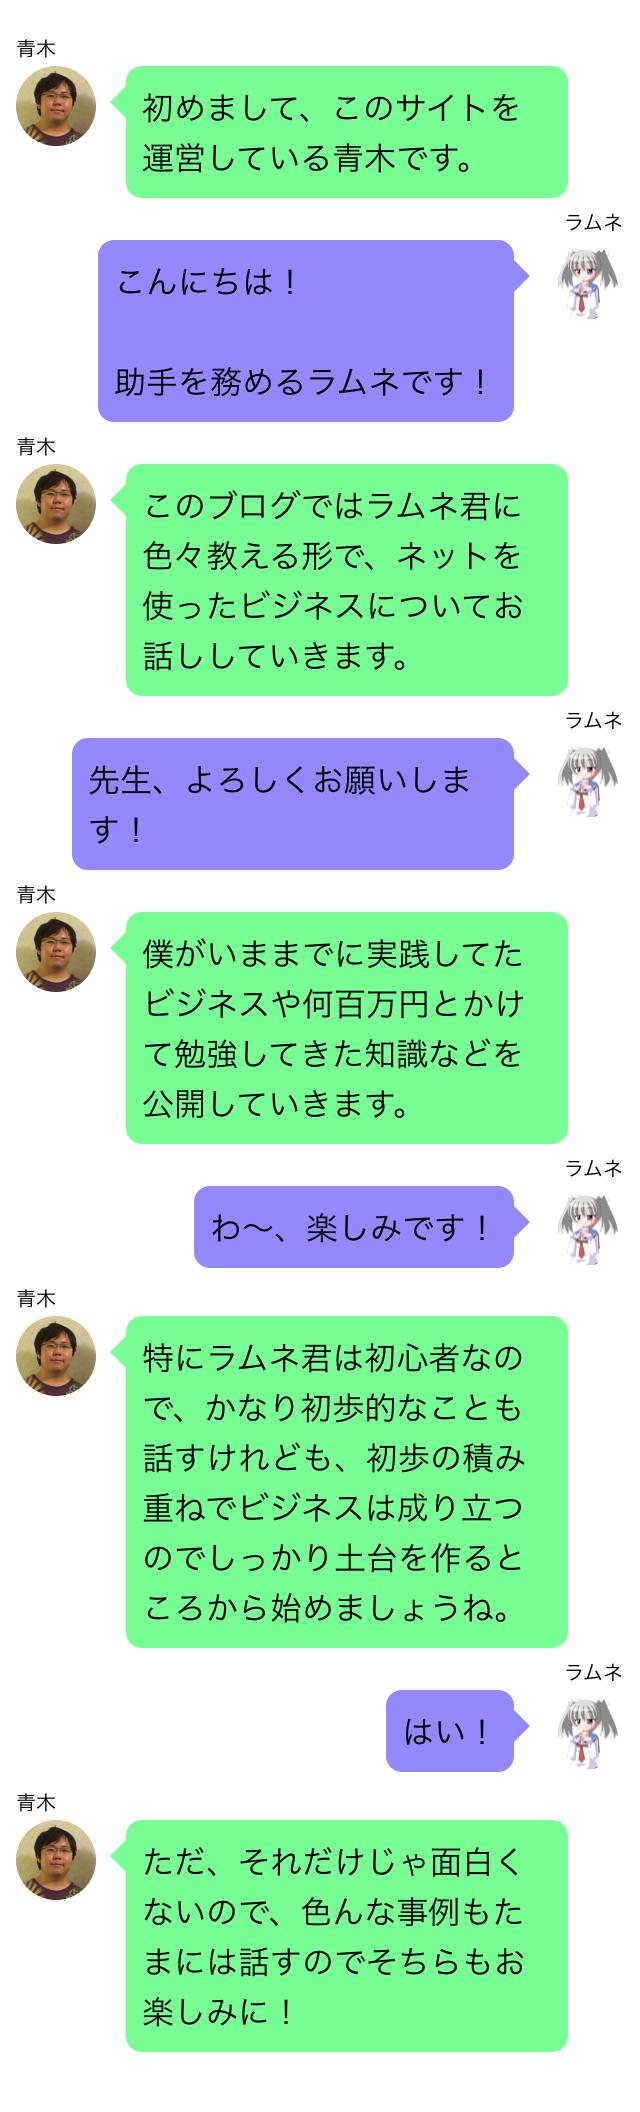 img_2255